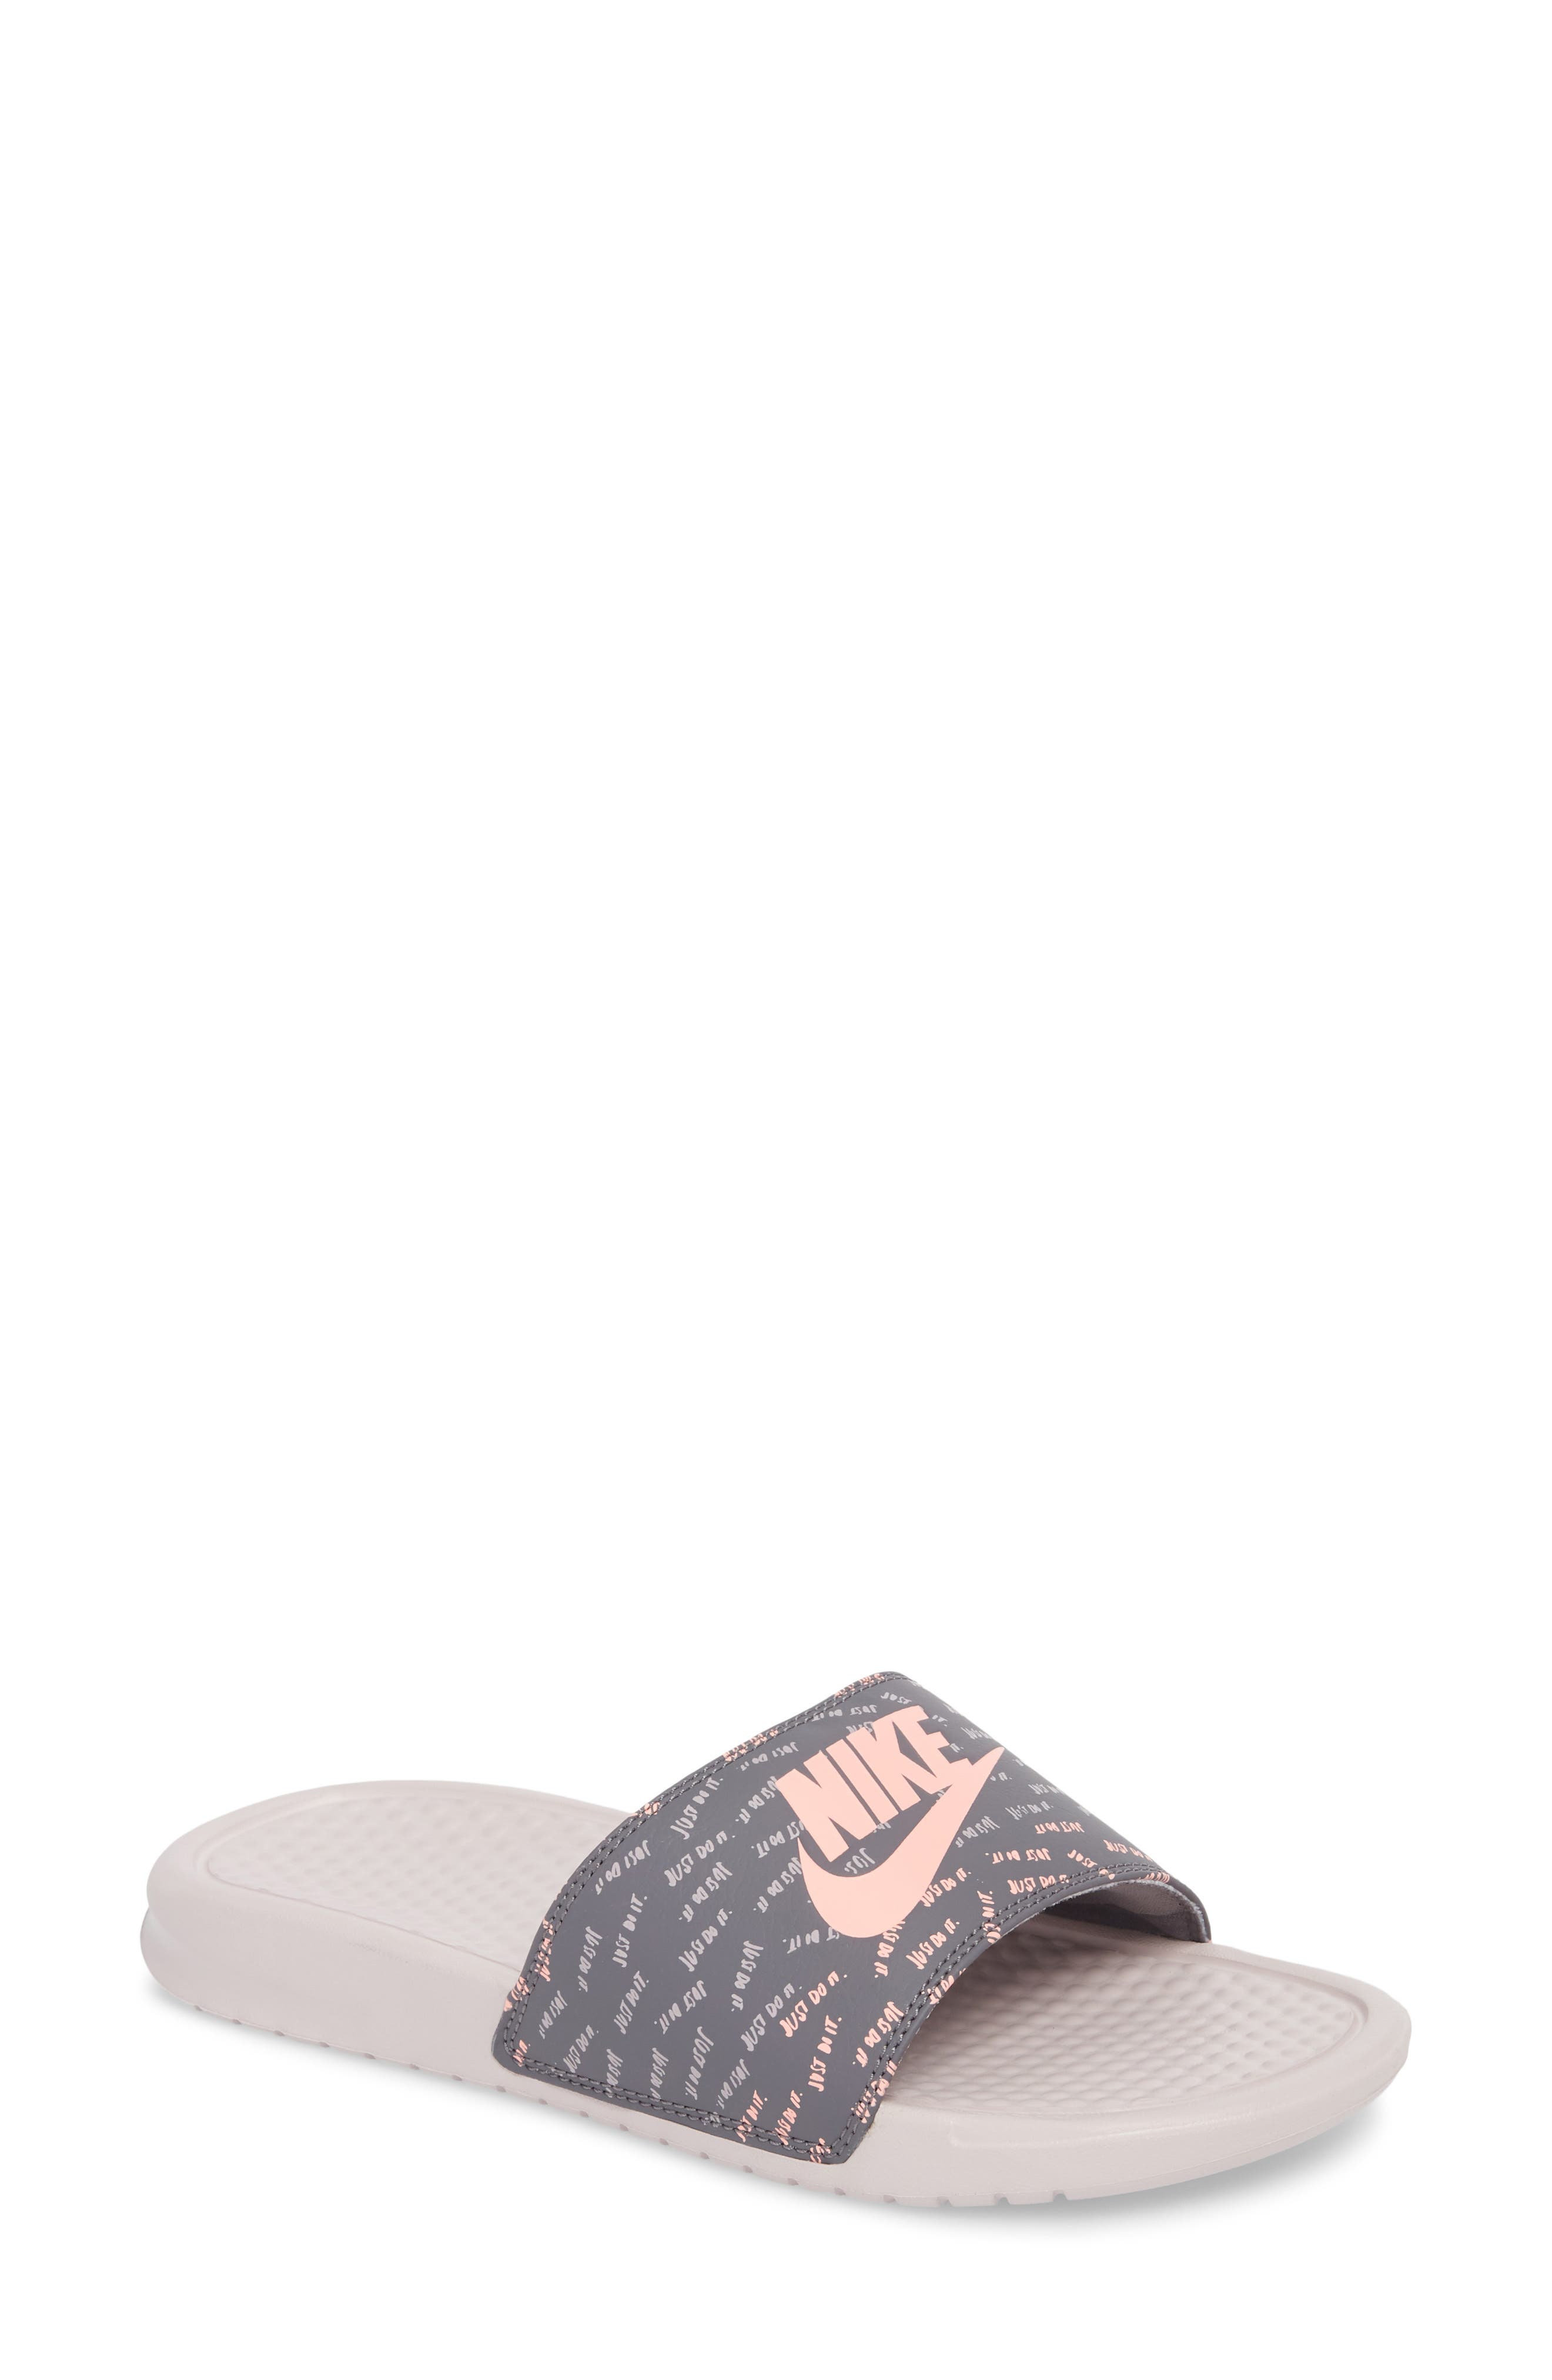 Nike 'Benassi - Just Do It' Print Sandal (Women)